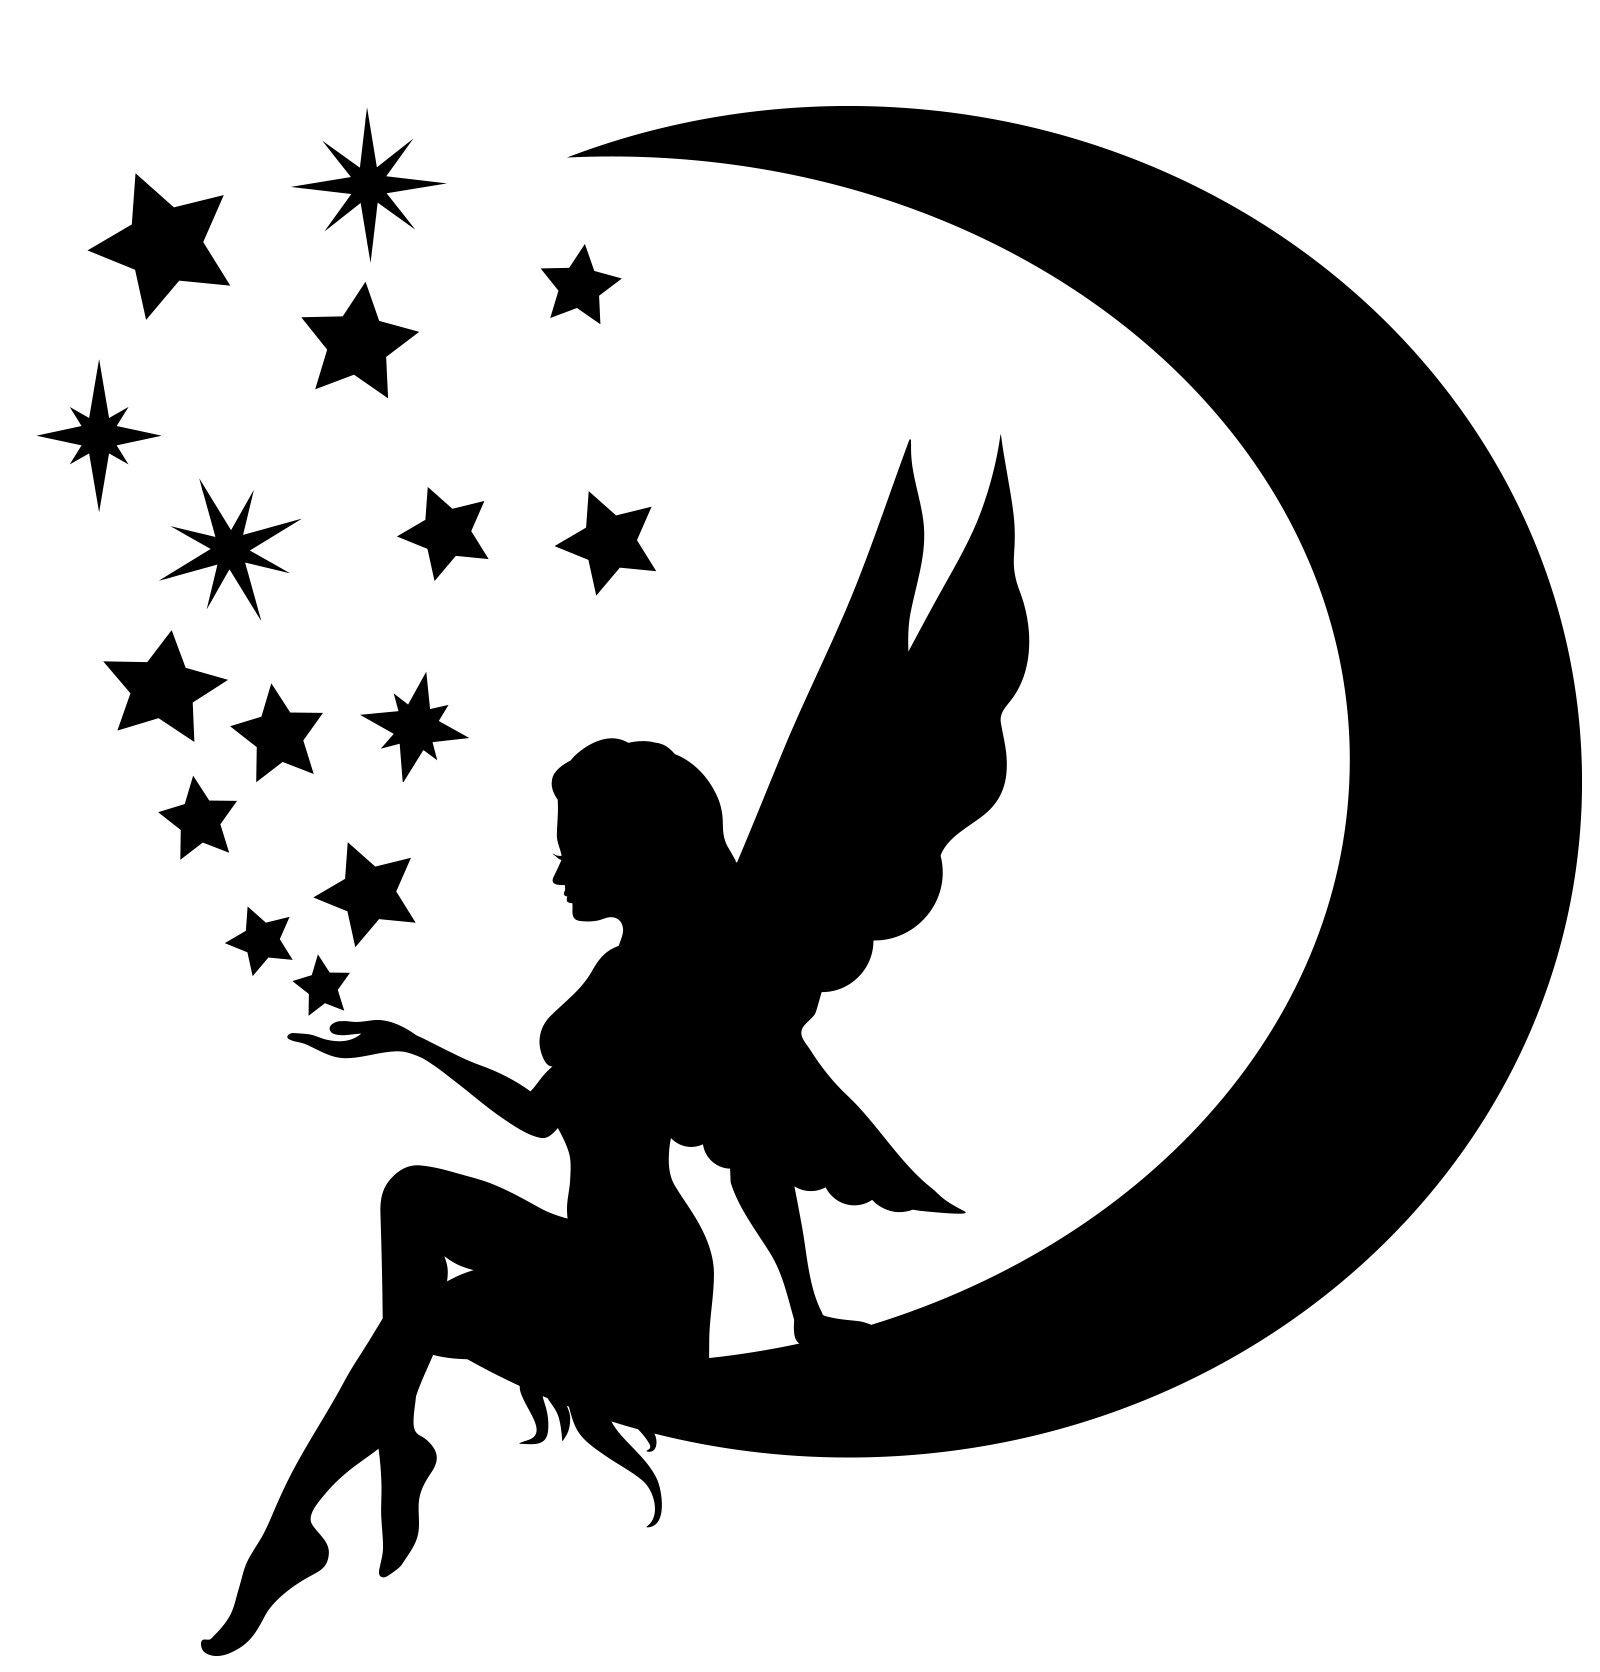 star swirl design - google